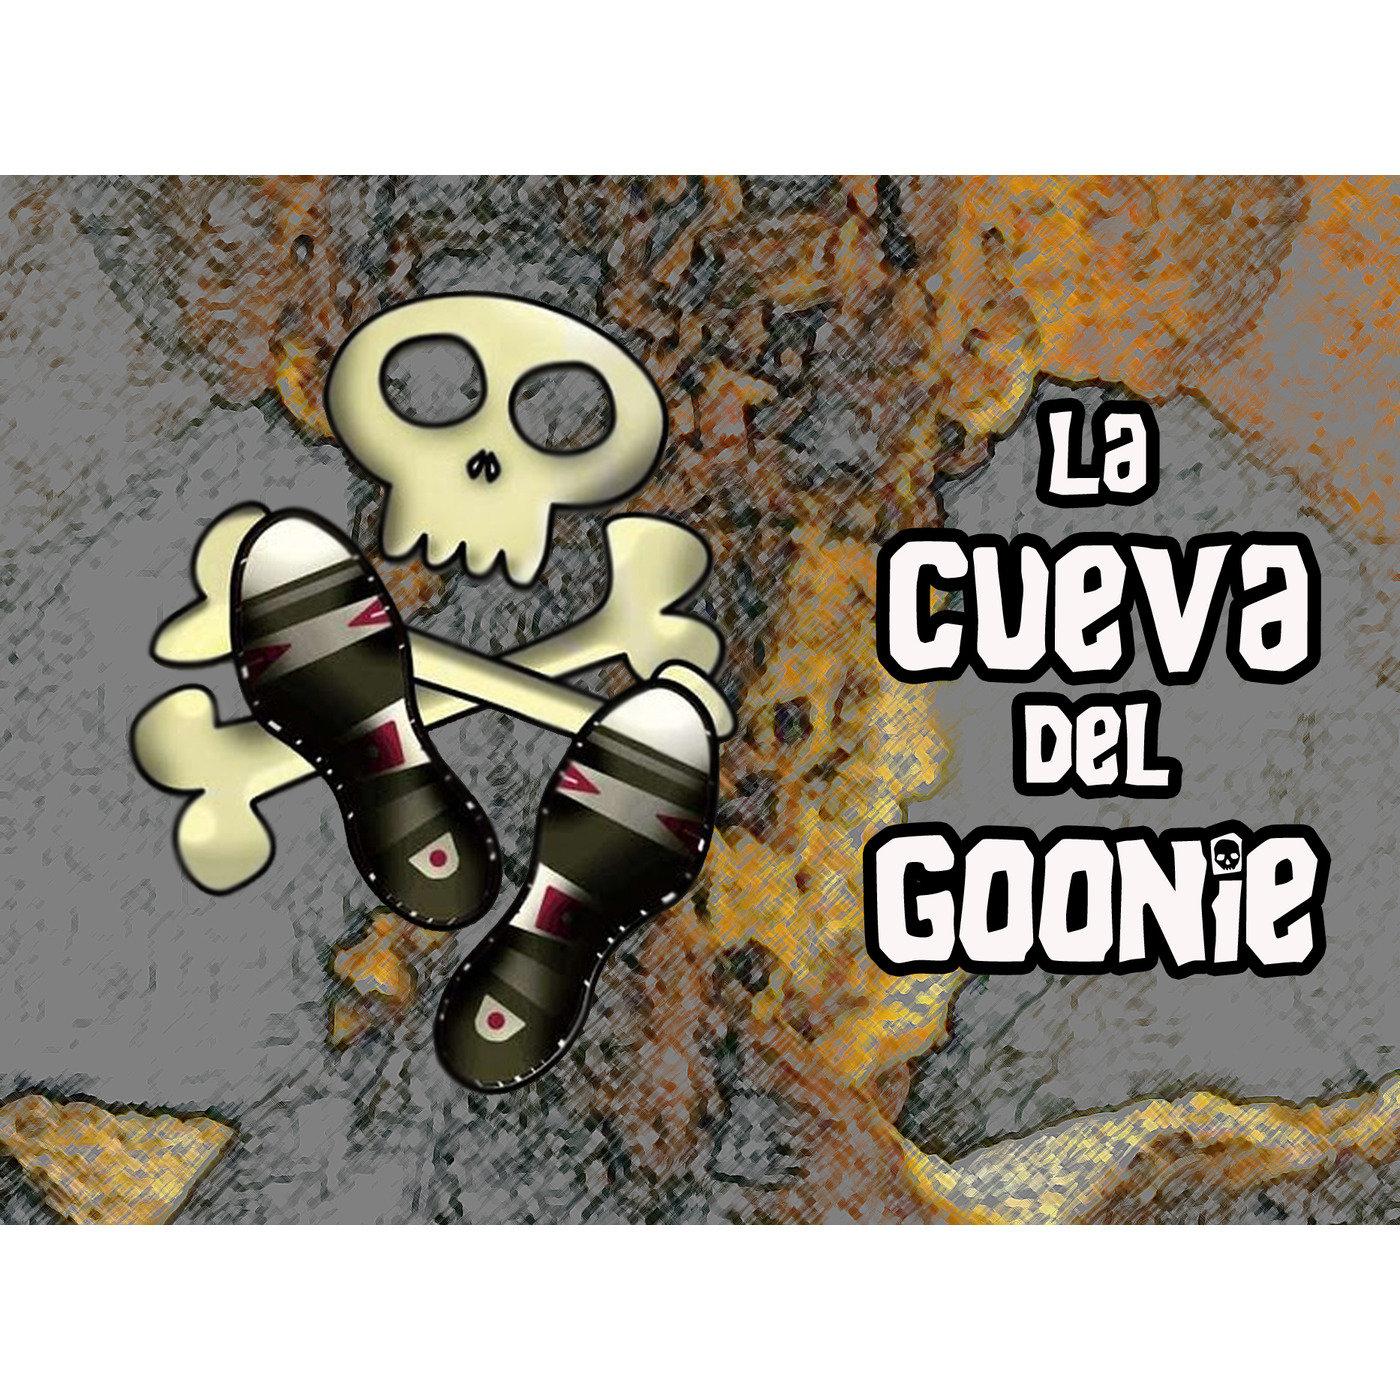 <![CDATA[Podcast de La Cueva del Goonie]]>